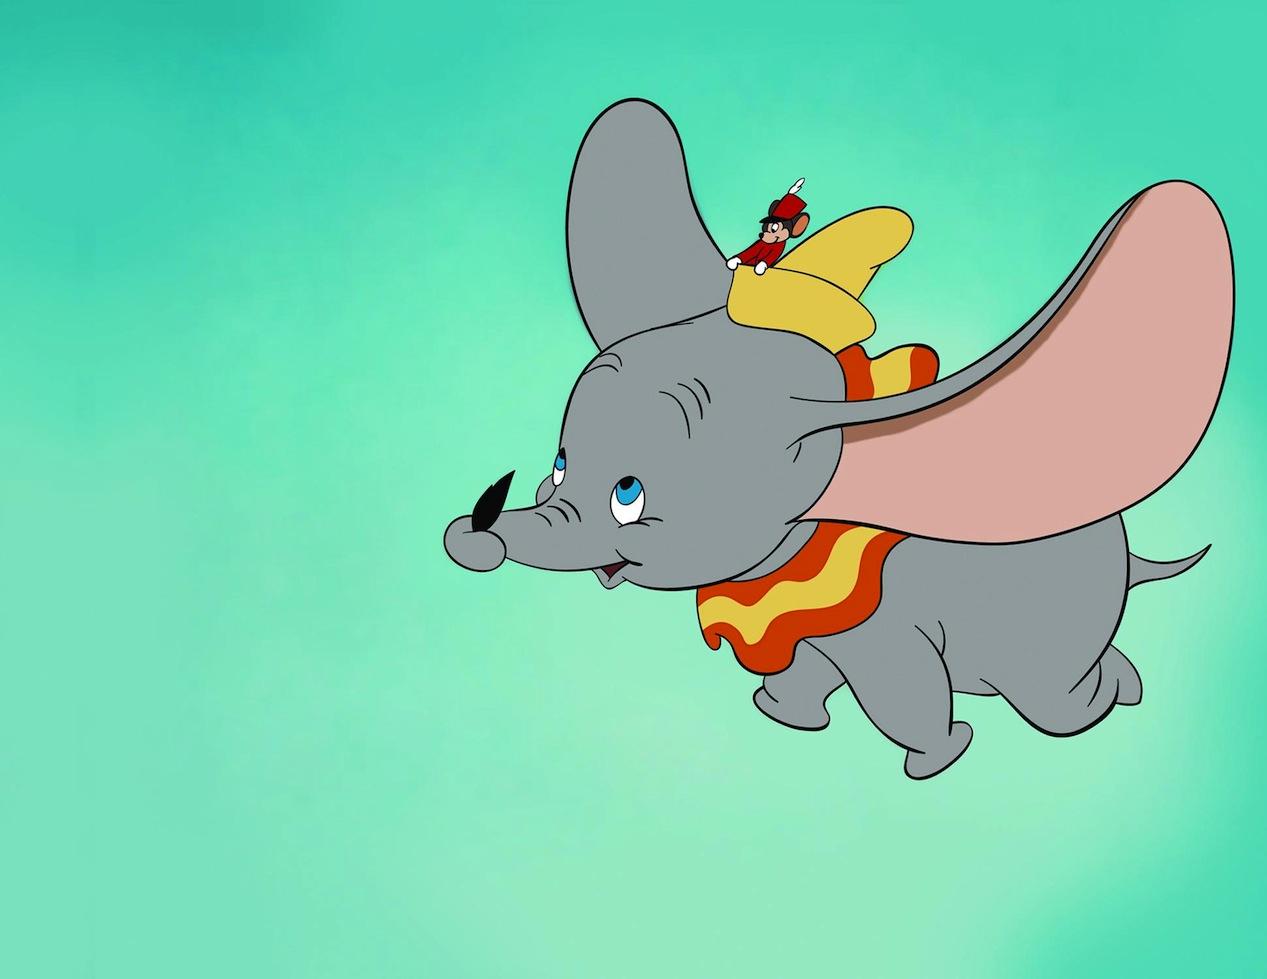 Dumbo Va De Nouveau Voler Grâce À Tim Burton - Amonine - Le dedans Dessin Dumbo